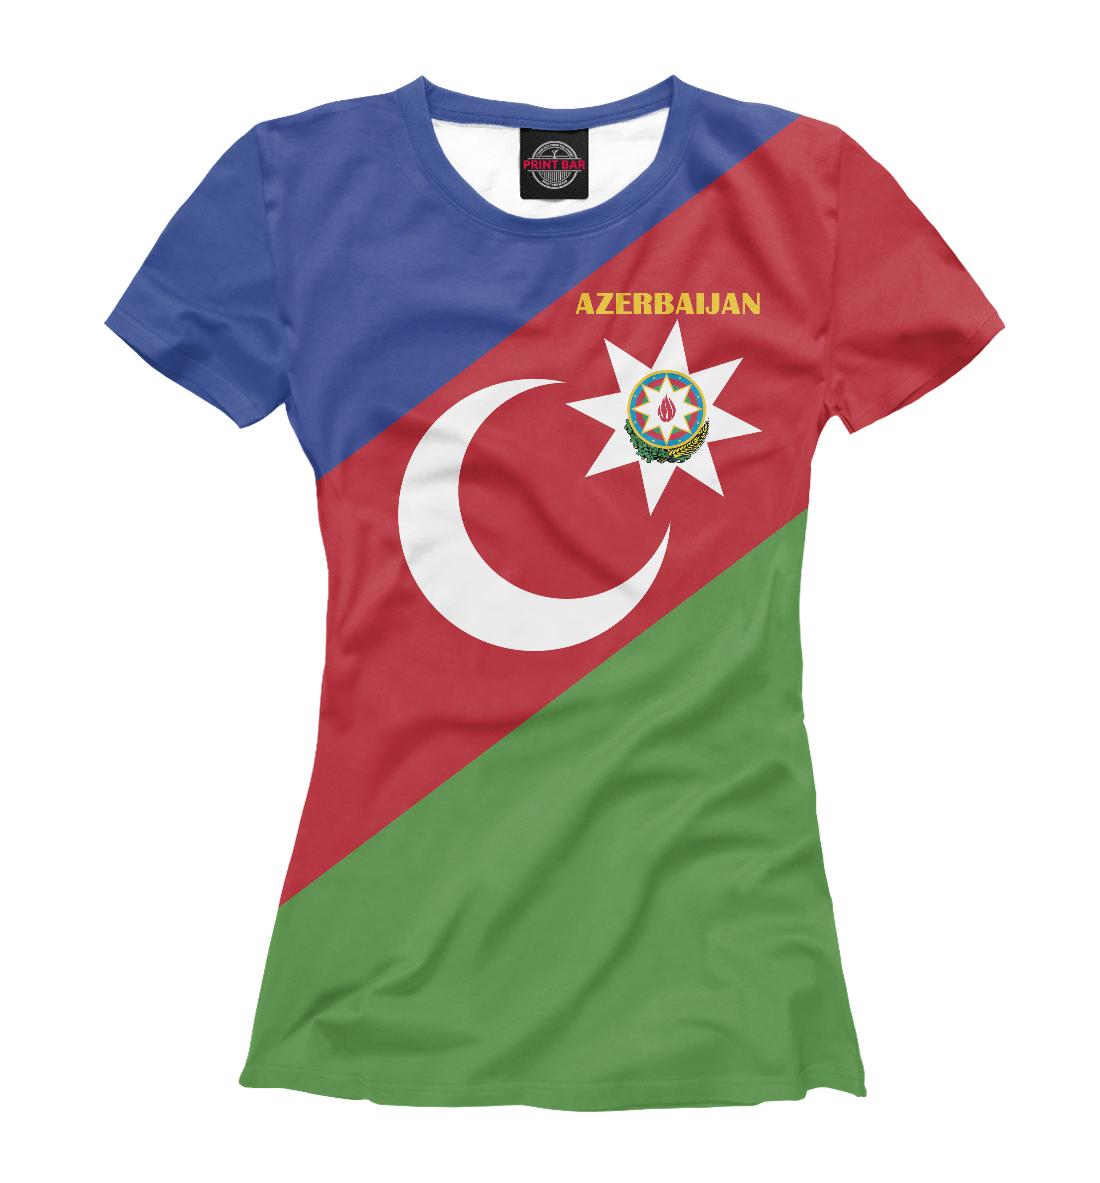 Azerbaijan - герб и флаг